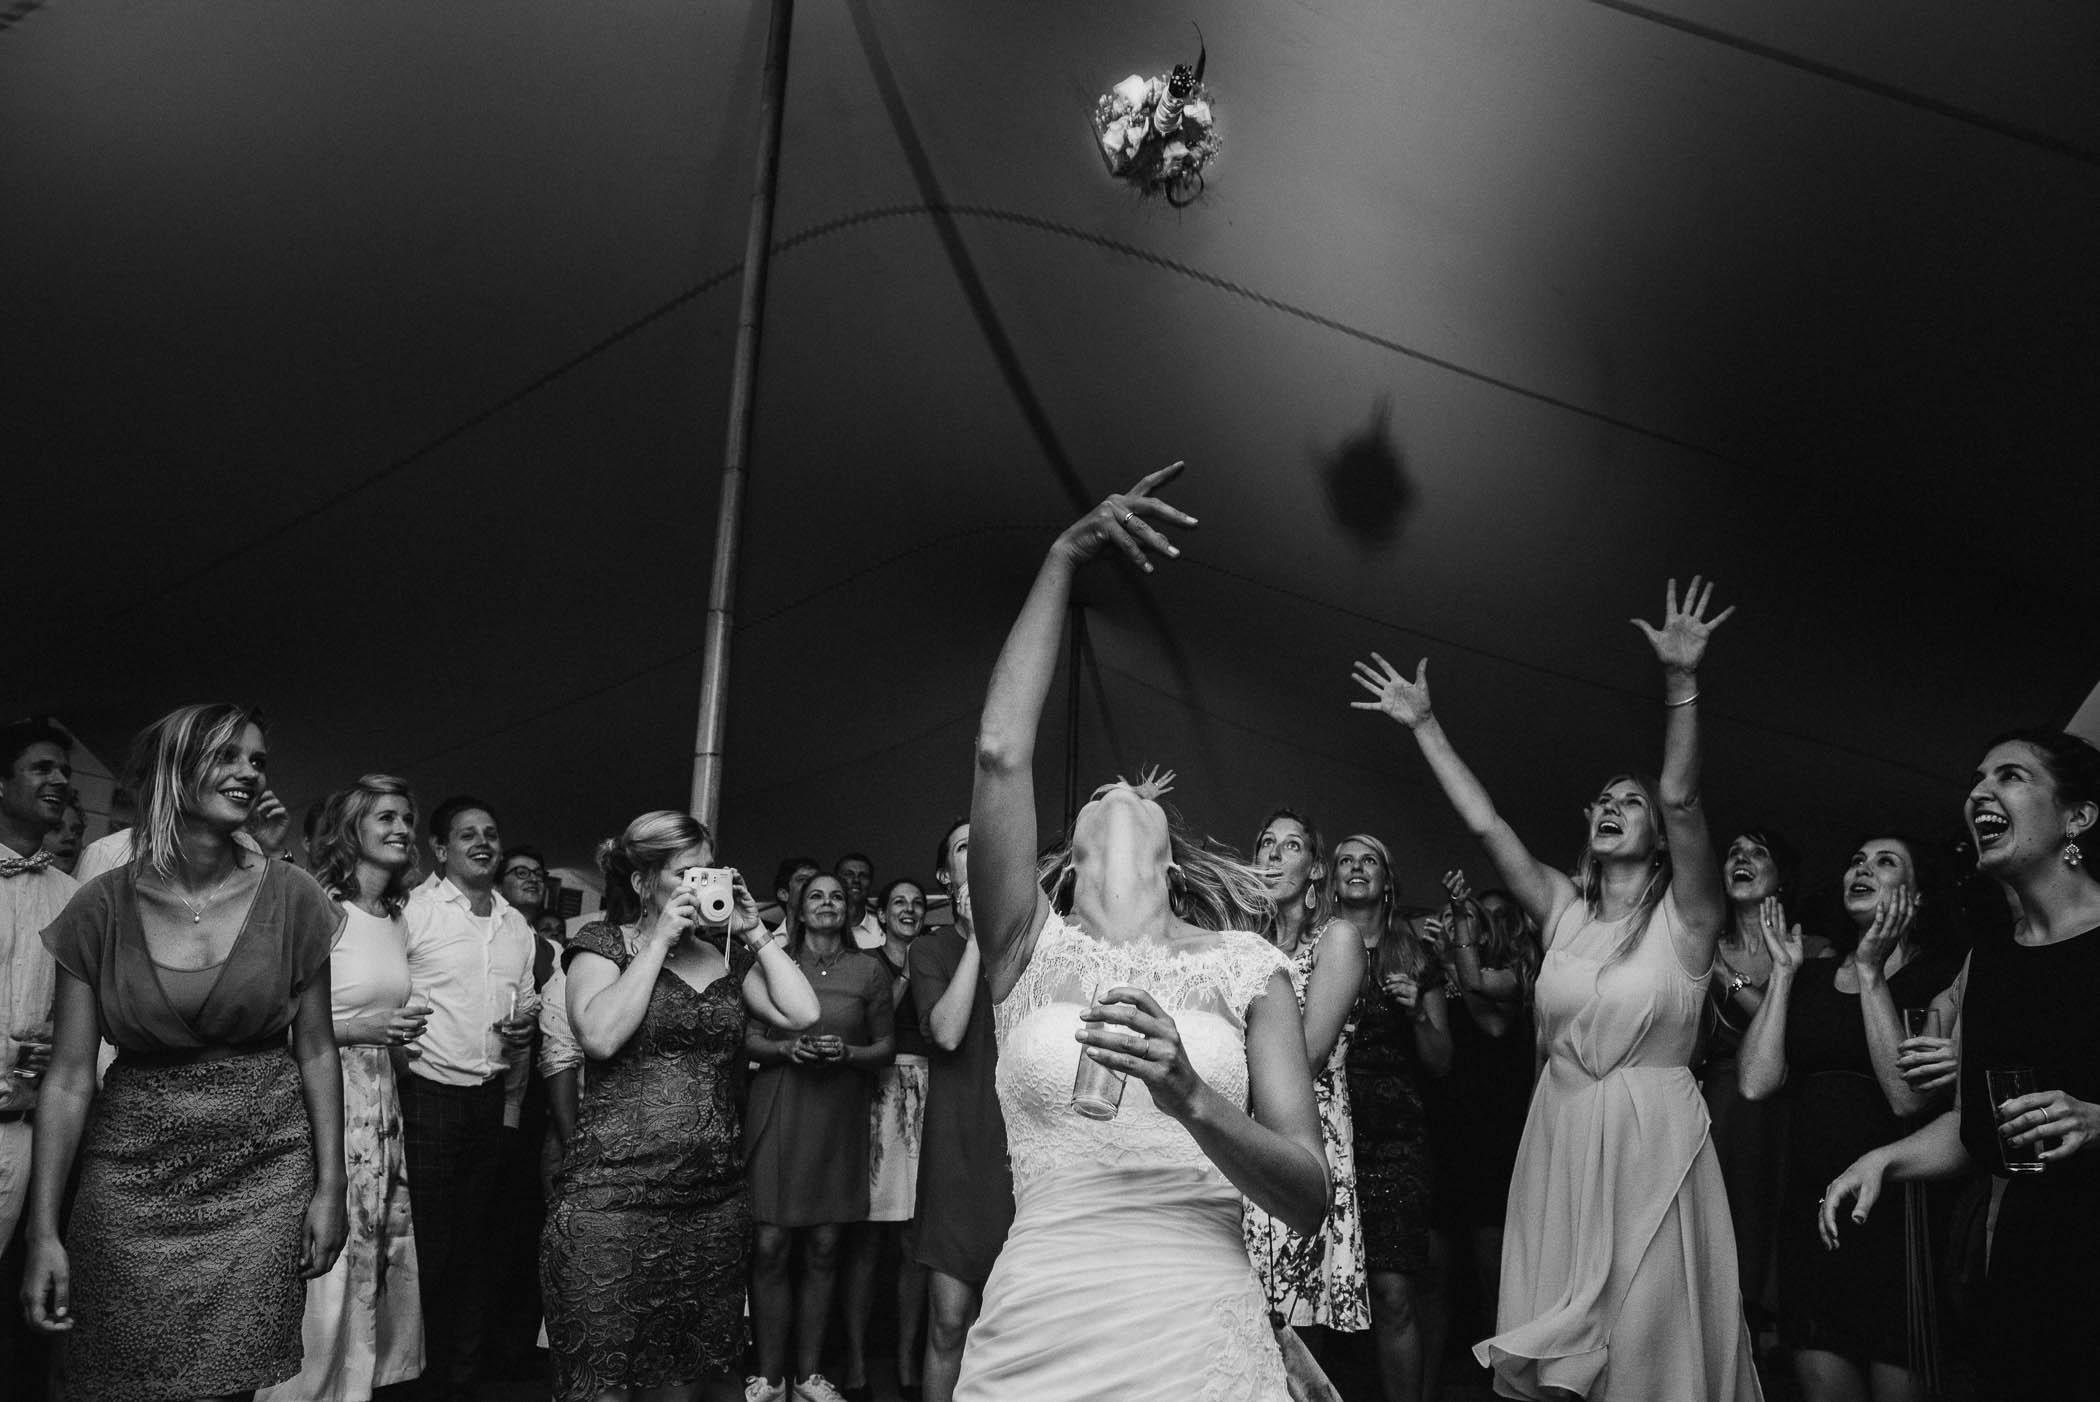 bruidsboeket gooien bruidsfotograaf journalistiek